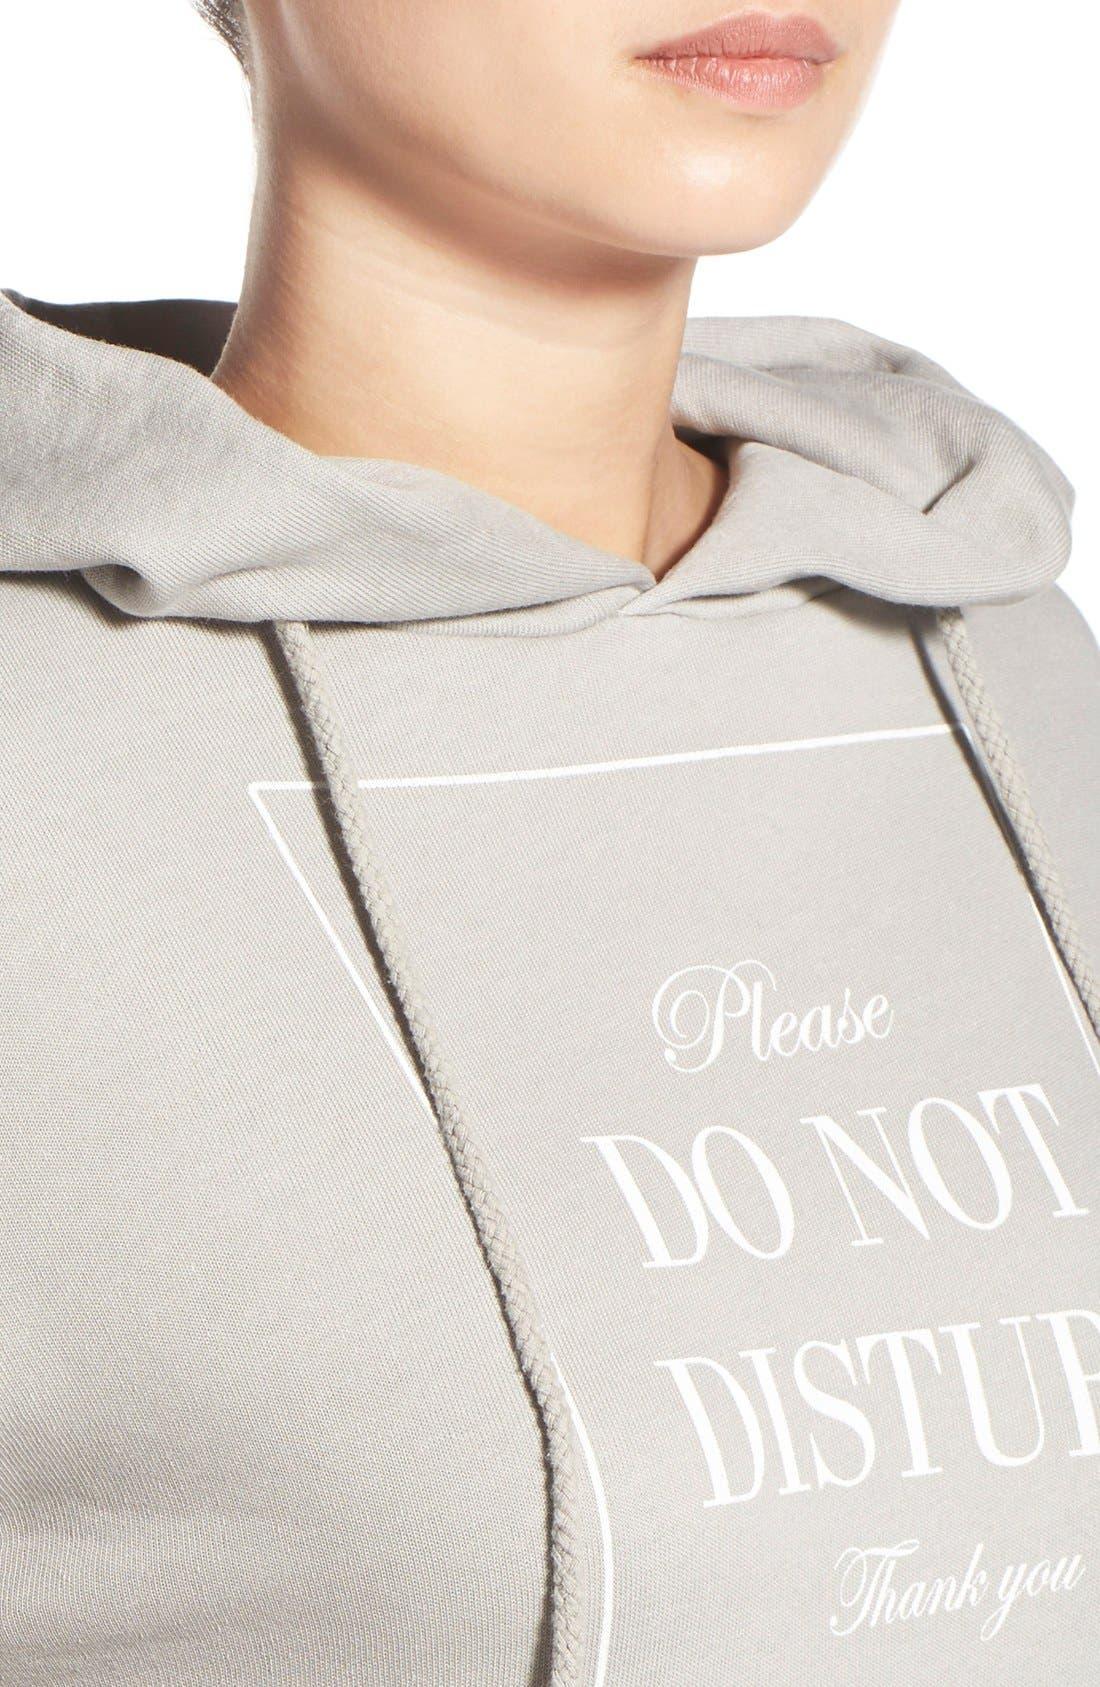 'Please Do Not Disturb' Hooded Sweatshirt,                             Alternate thumbnail 4, color,                             060